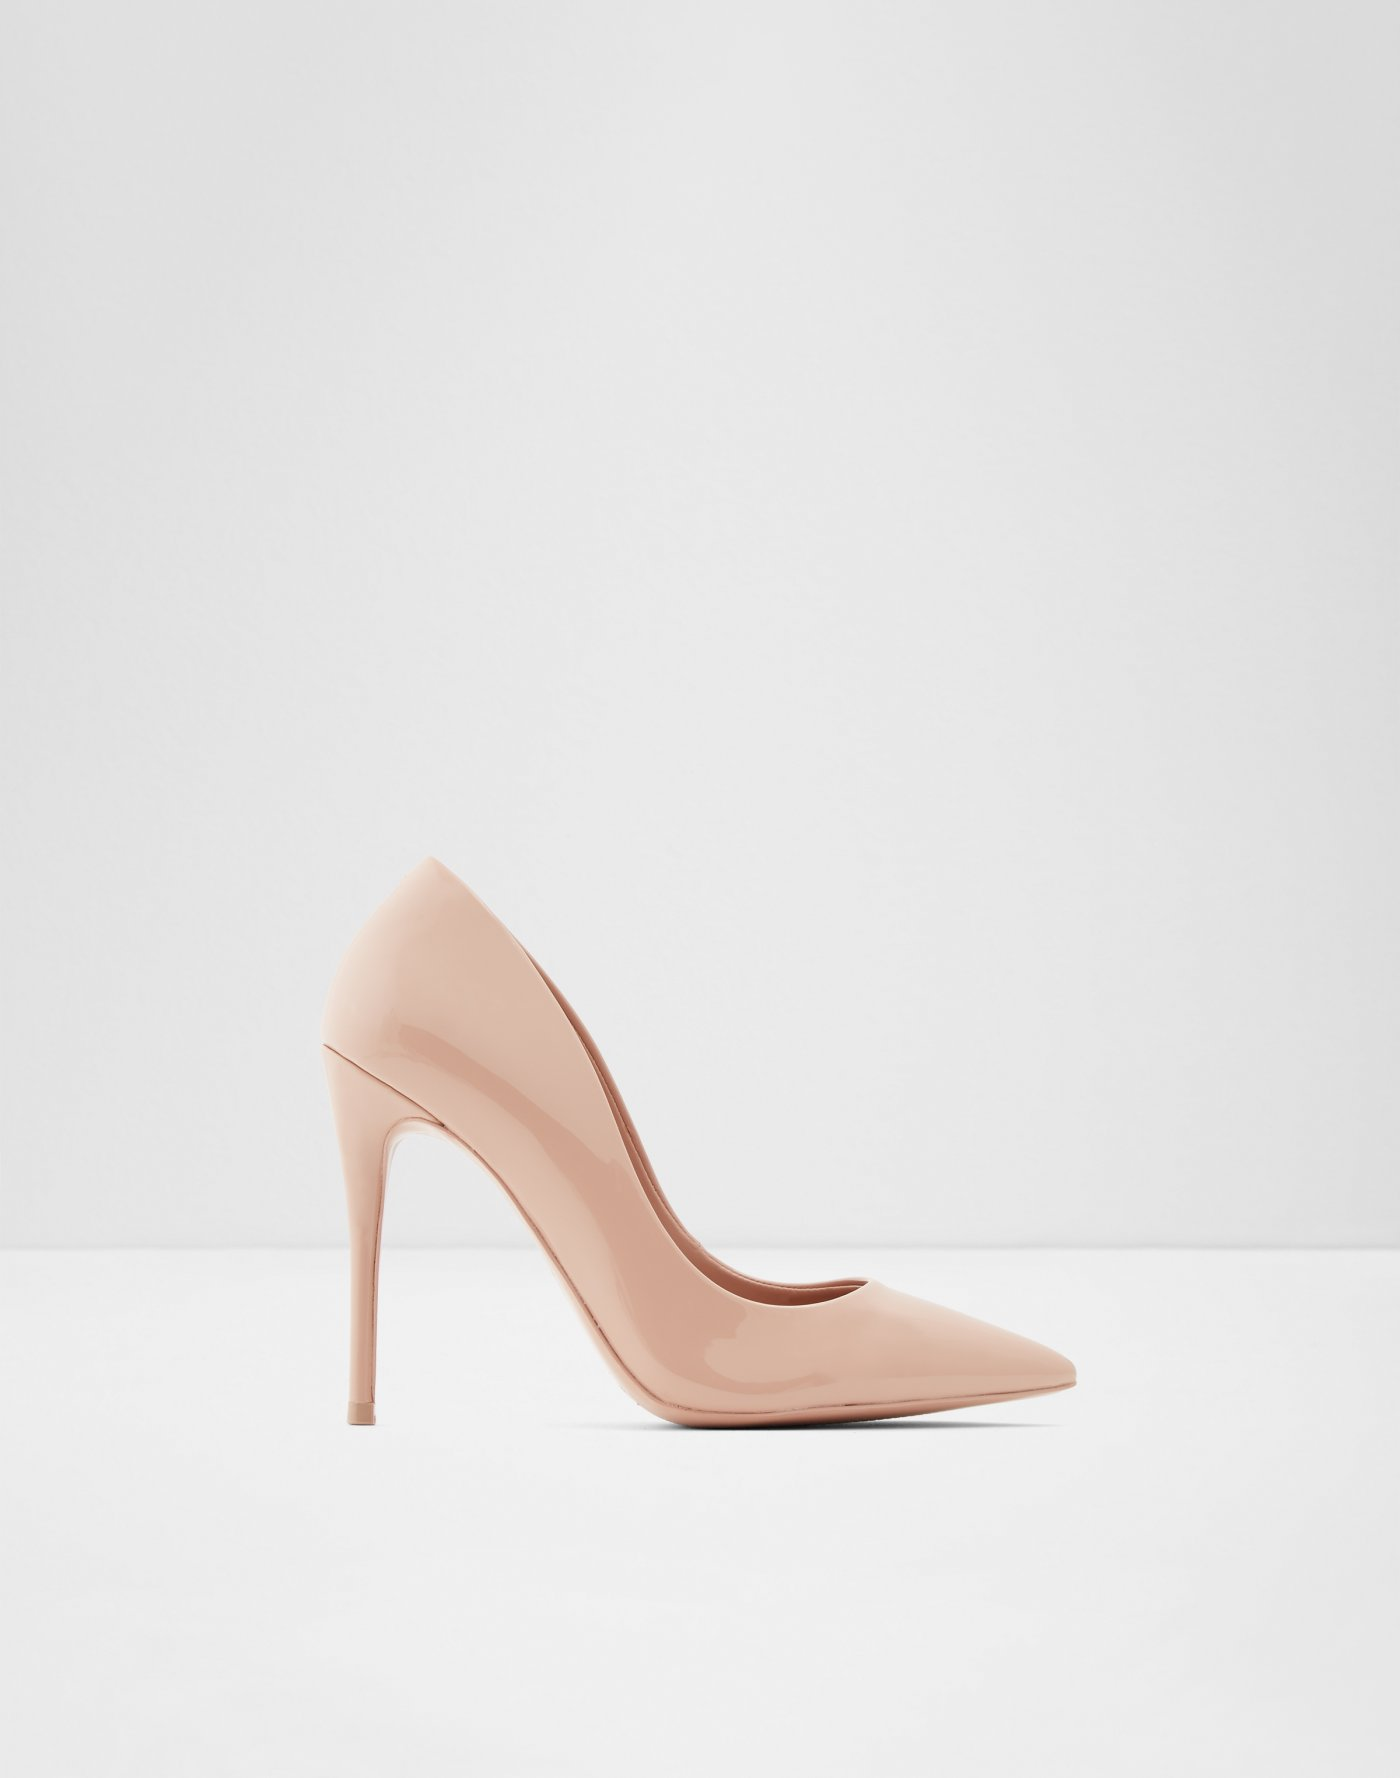 Wide Width Shoes For Women | ALDO US | Aldoshoes.com US